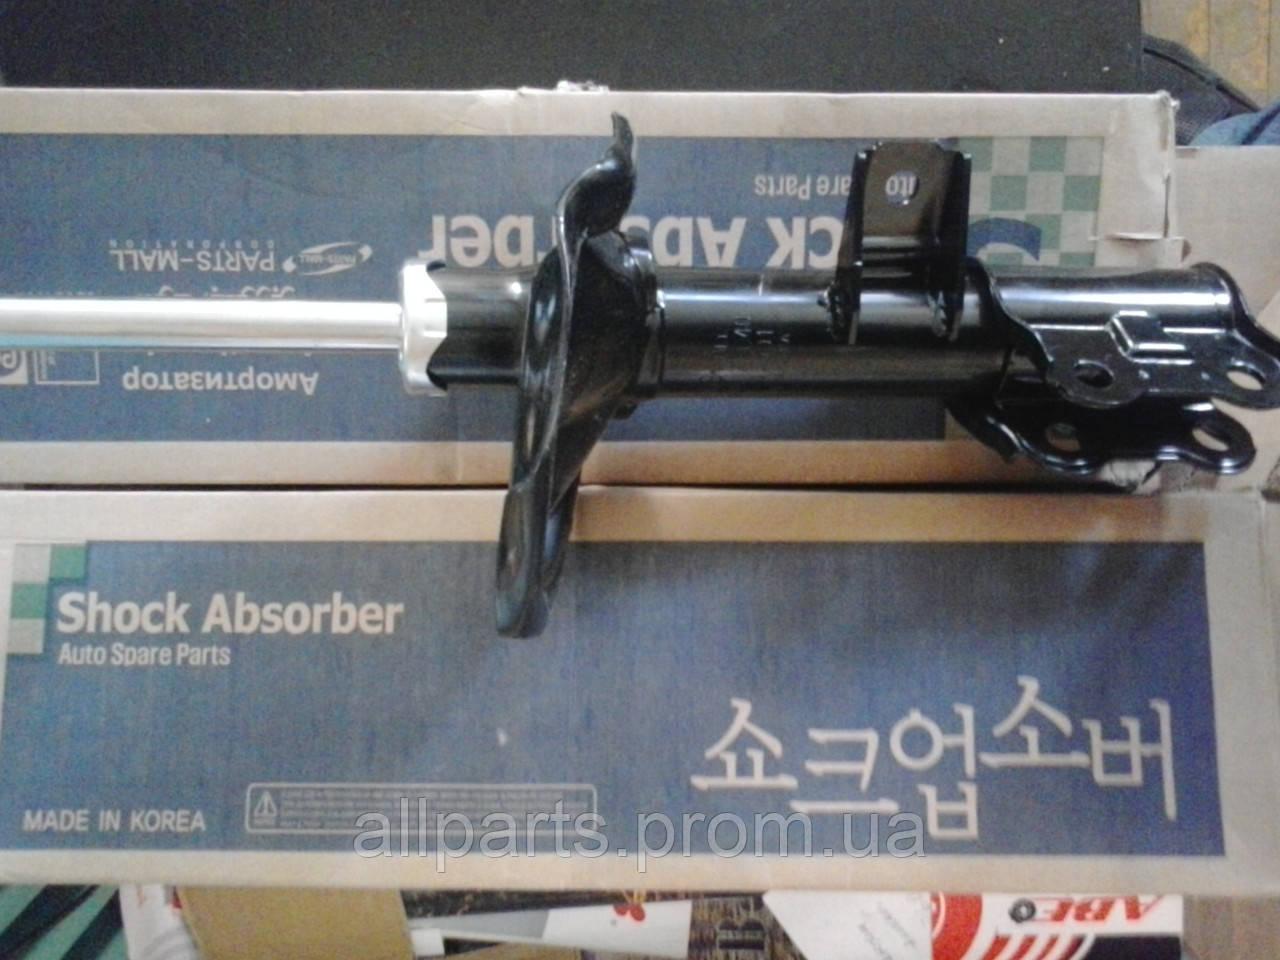 Амортизаторы PMC и запчасти Parts-Mall (Партсмол, страна производитель - Корея)